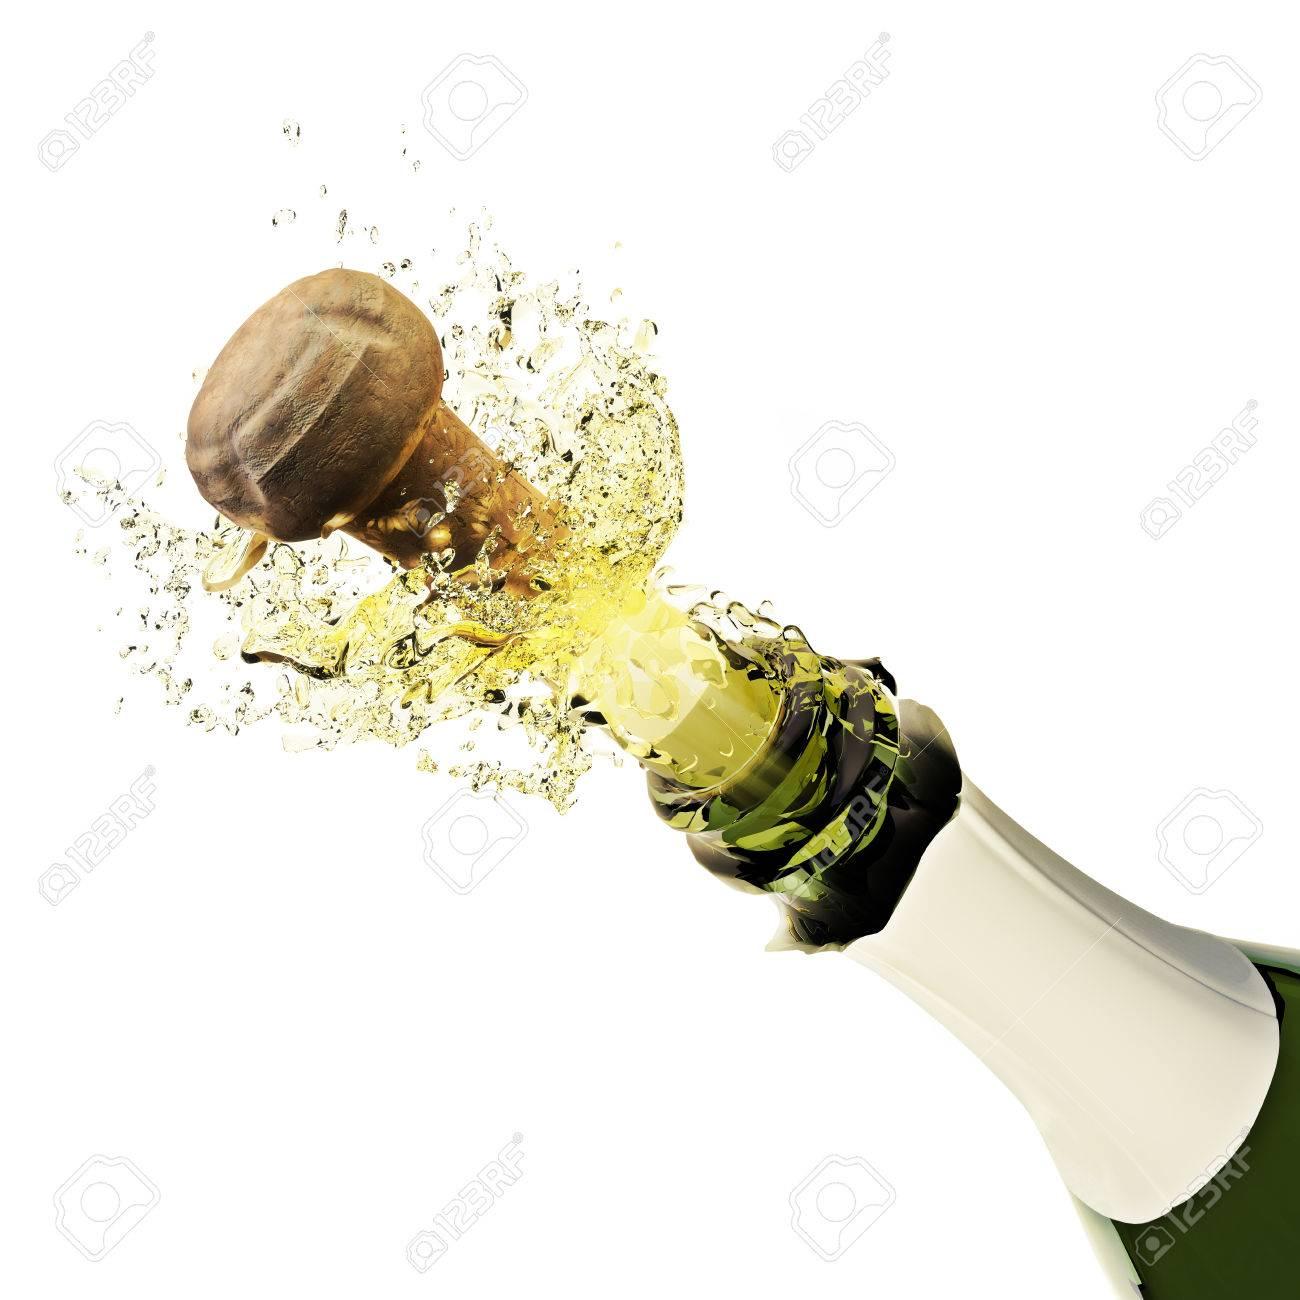 Champagne bottle popping on a white background Standard-Bild - 40862972